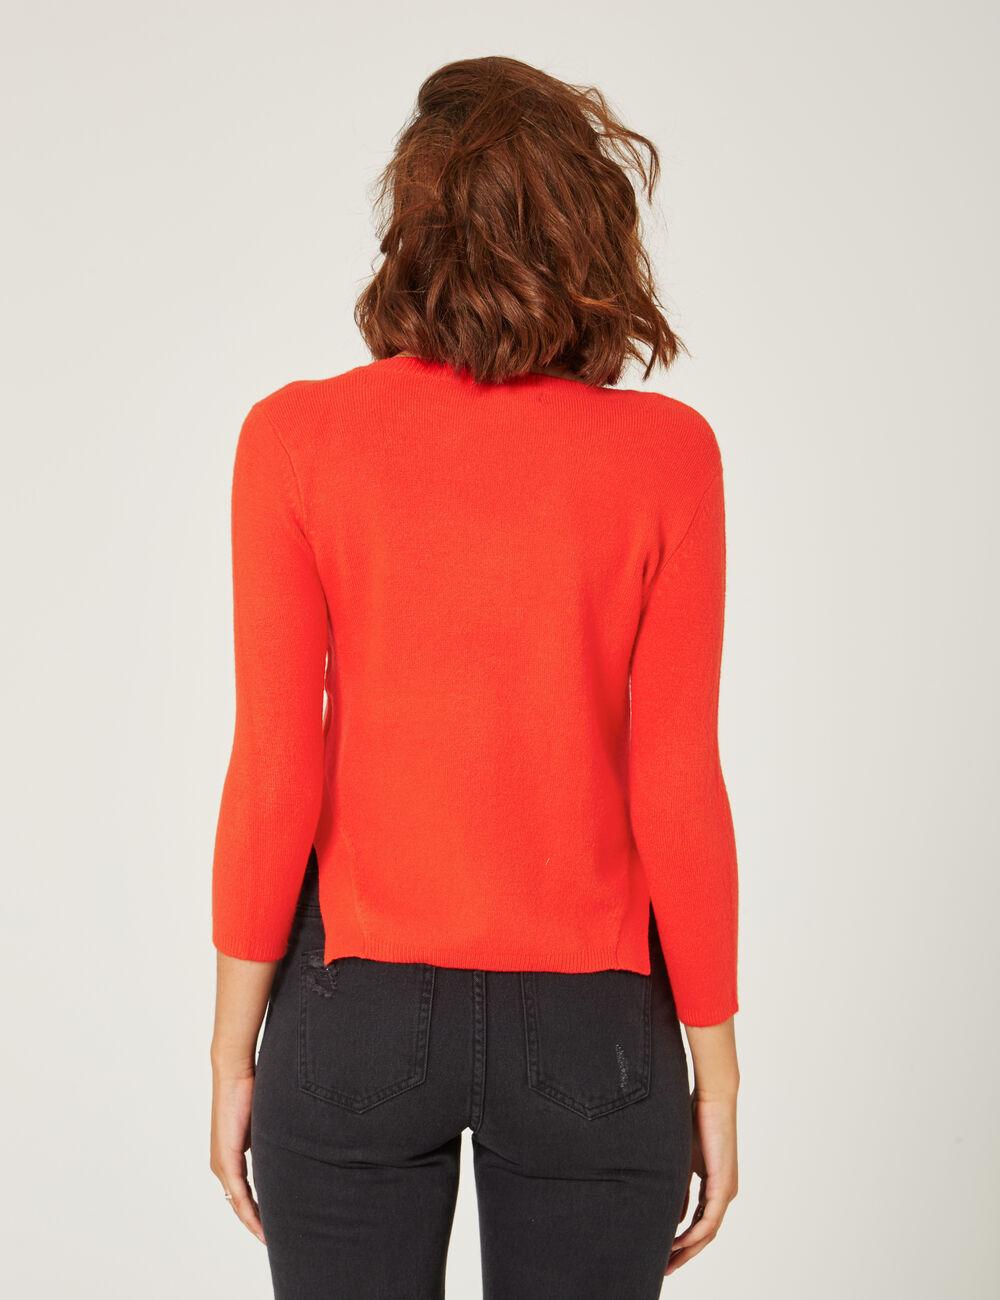 pull toucher cachemire rouge femme jennyfer. Black Bedroom Furniture Sets. Home Design Ideas